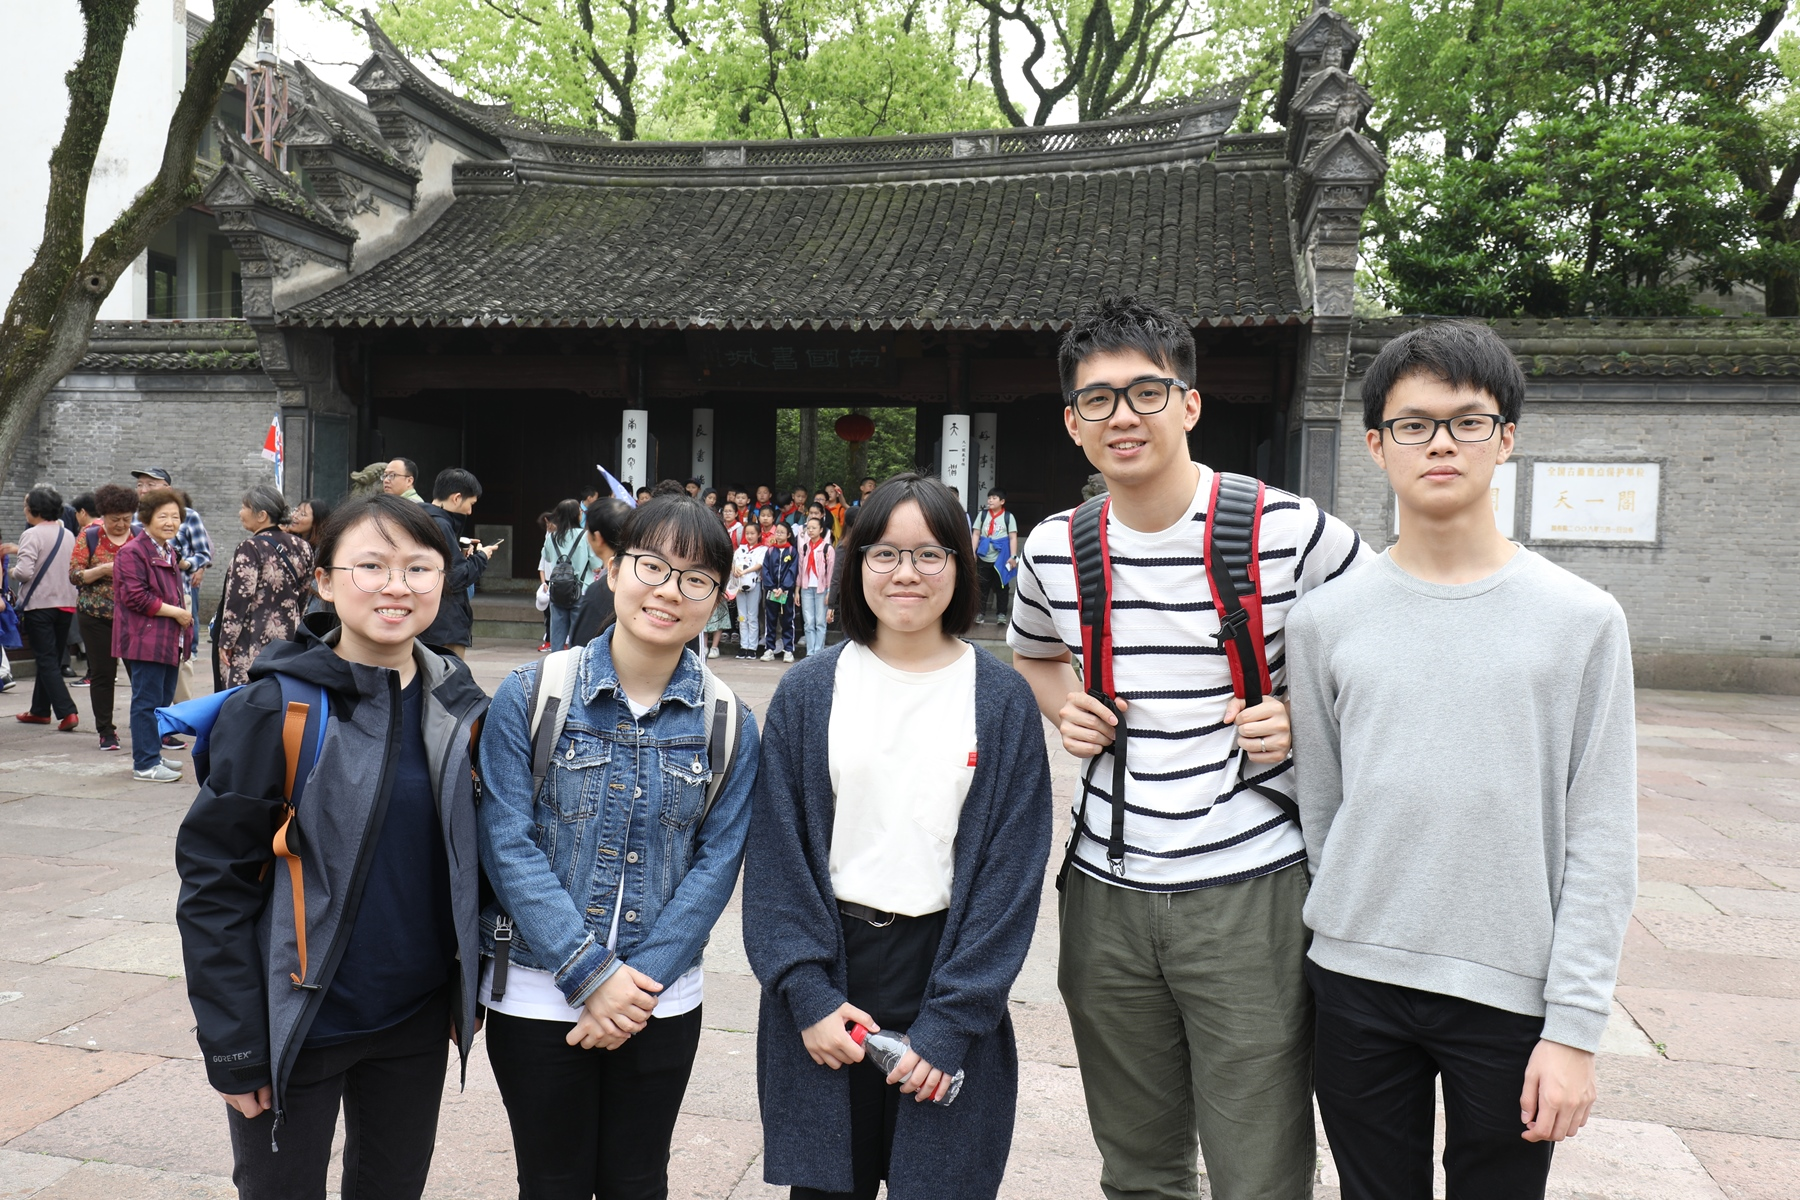 http://npc.edu.hk/sites/default/files/kcng3432.jpg